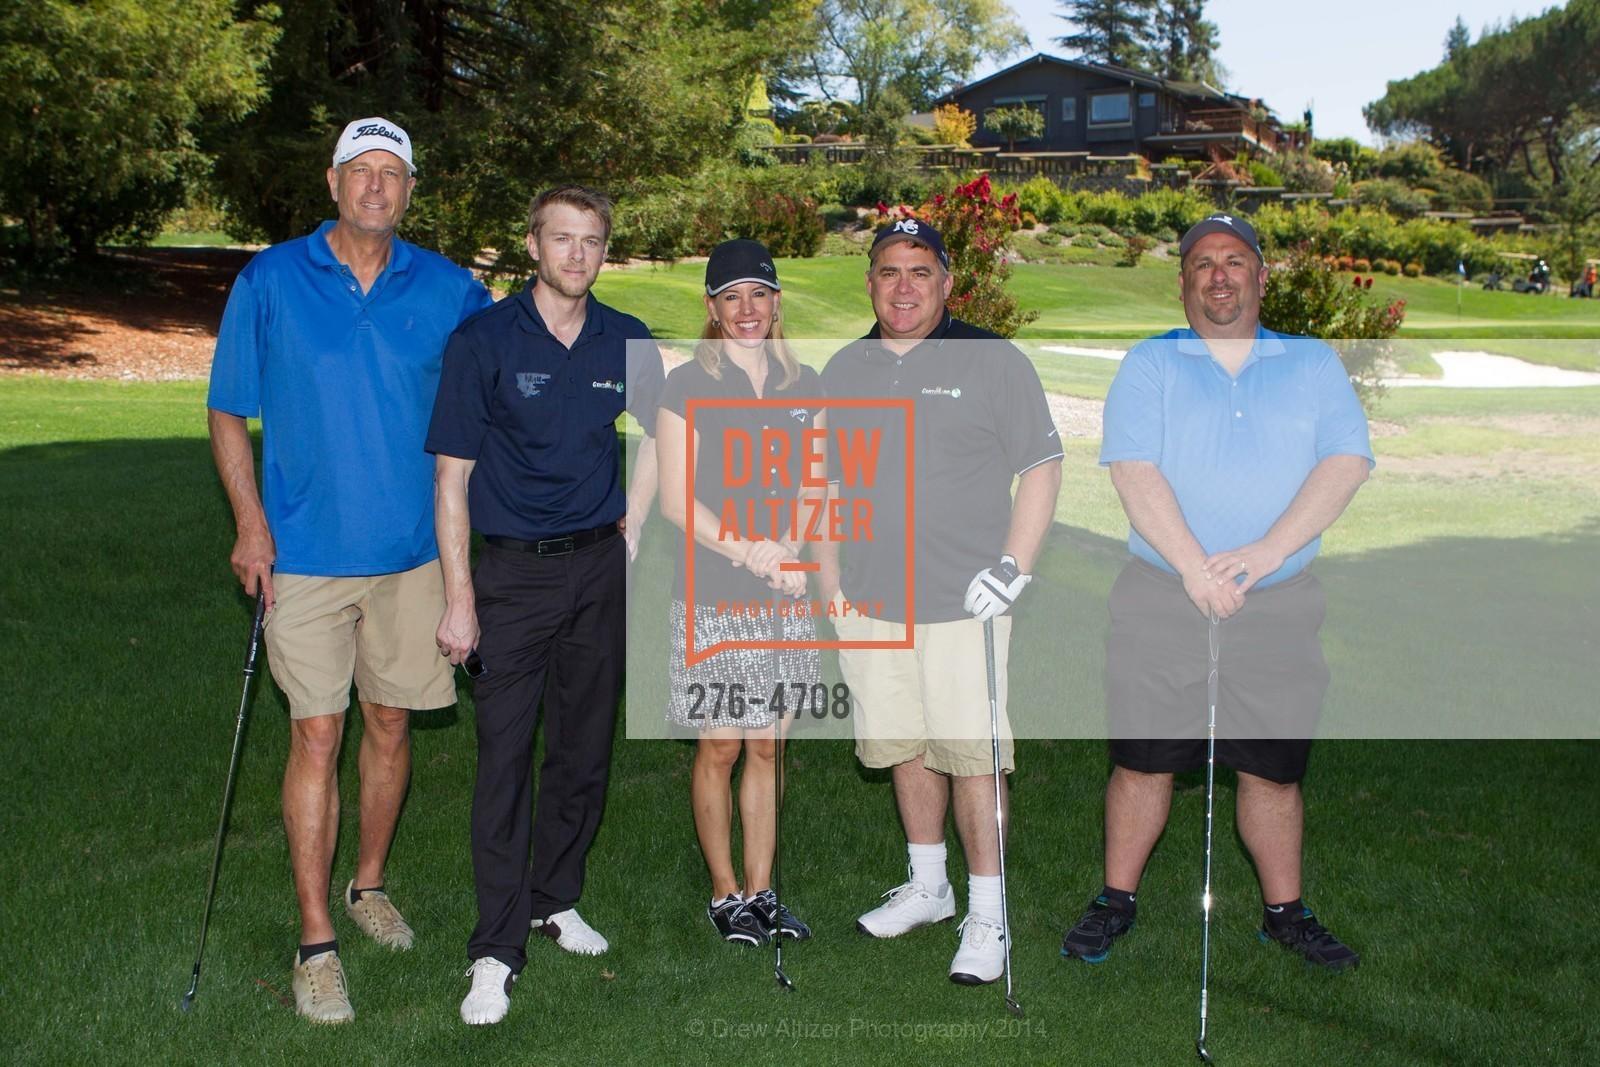 Dave Marcan, Matt Furst, Tina Michelson, Mason Nichols, Peter Landre, Photo #276-4708